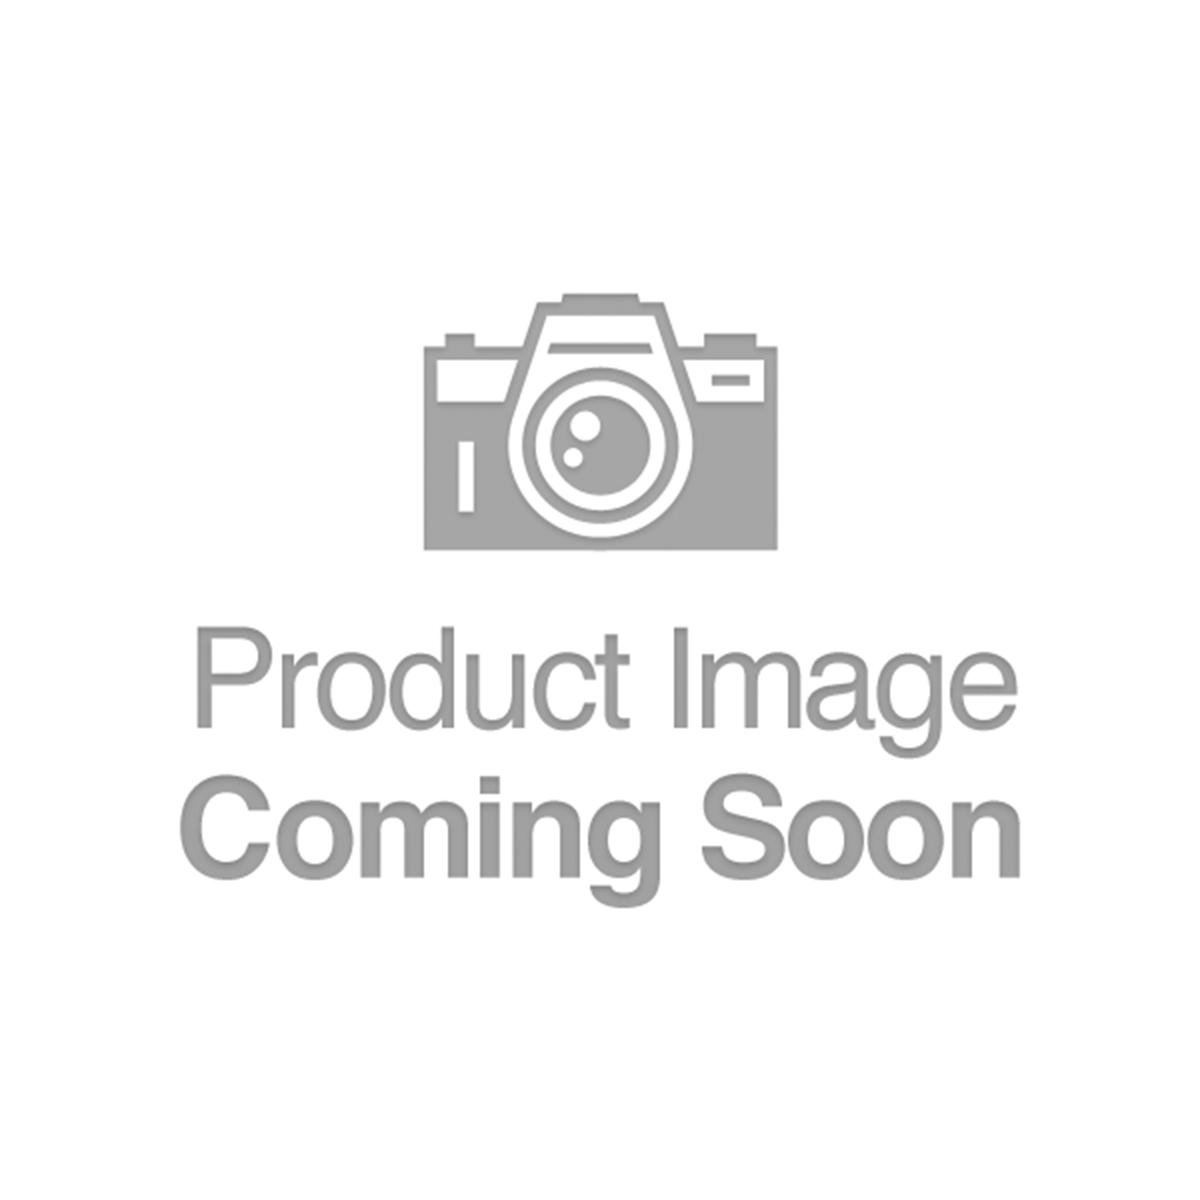 1793 H1C Cohen-2 Liberty Cap Half Cent PCGS MS62BN